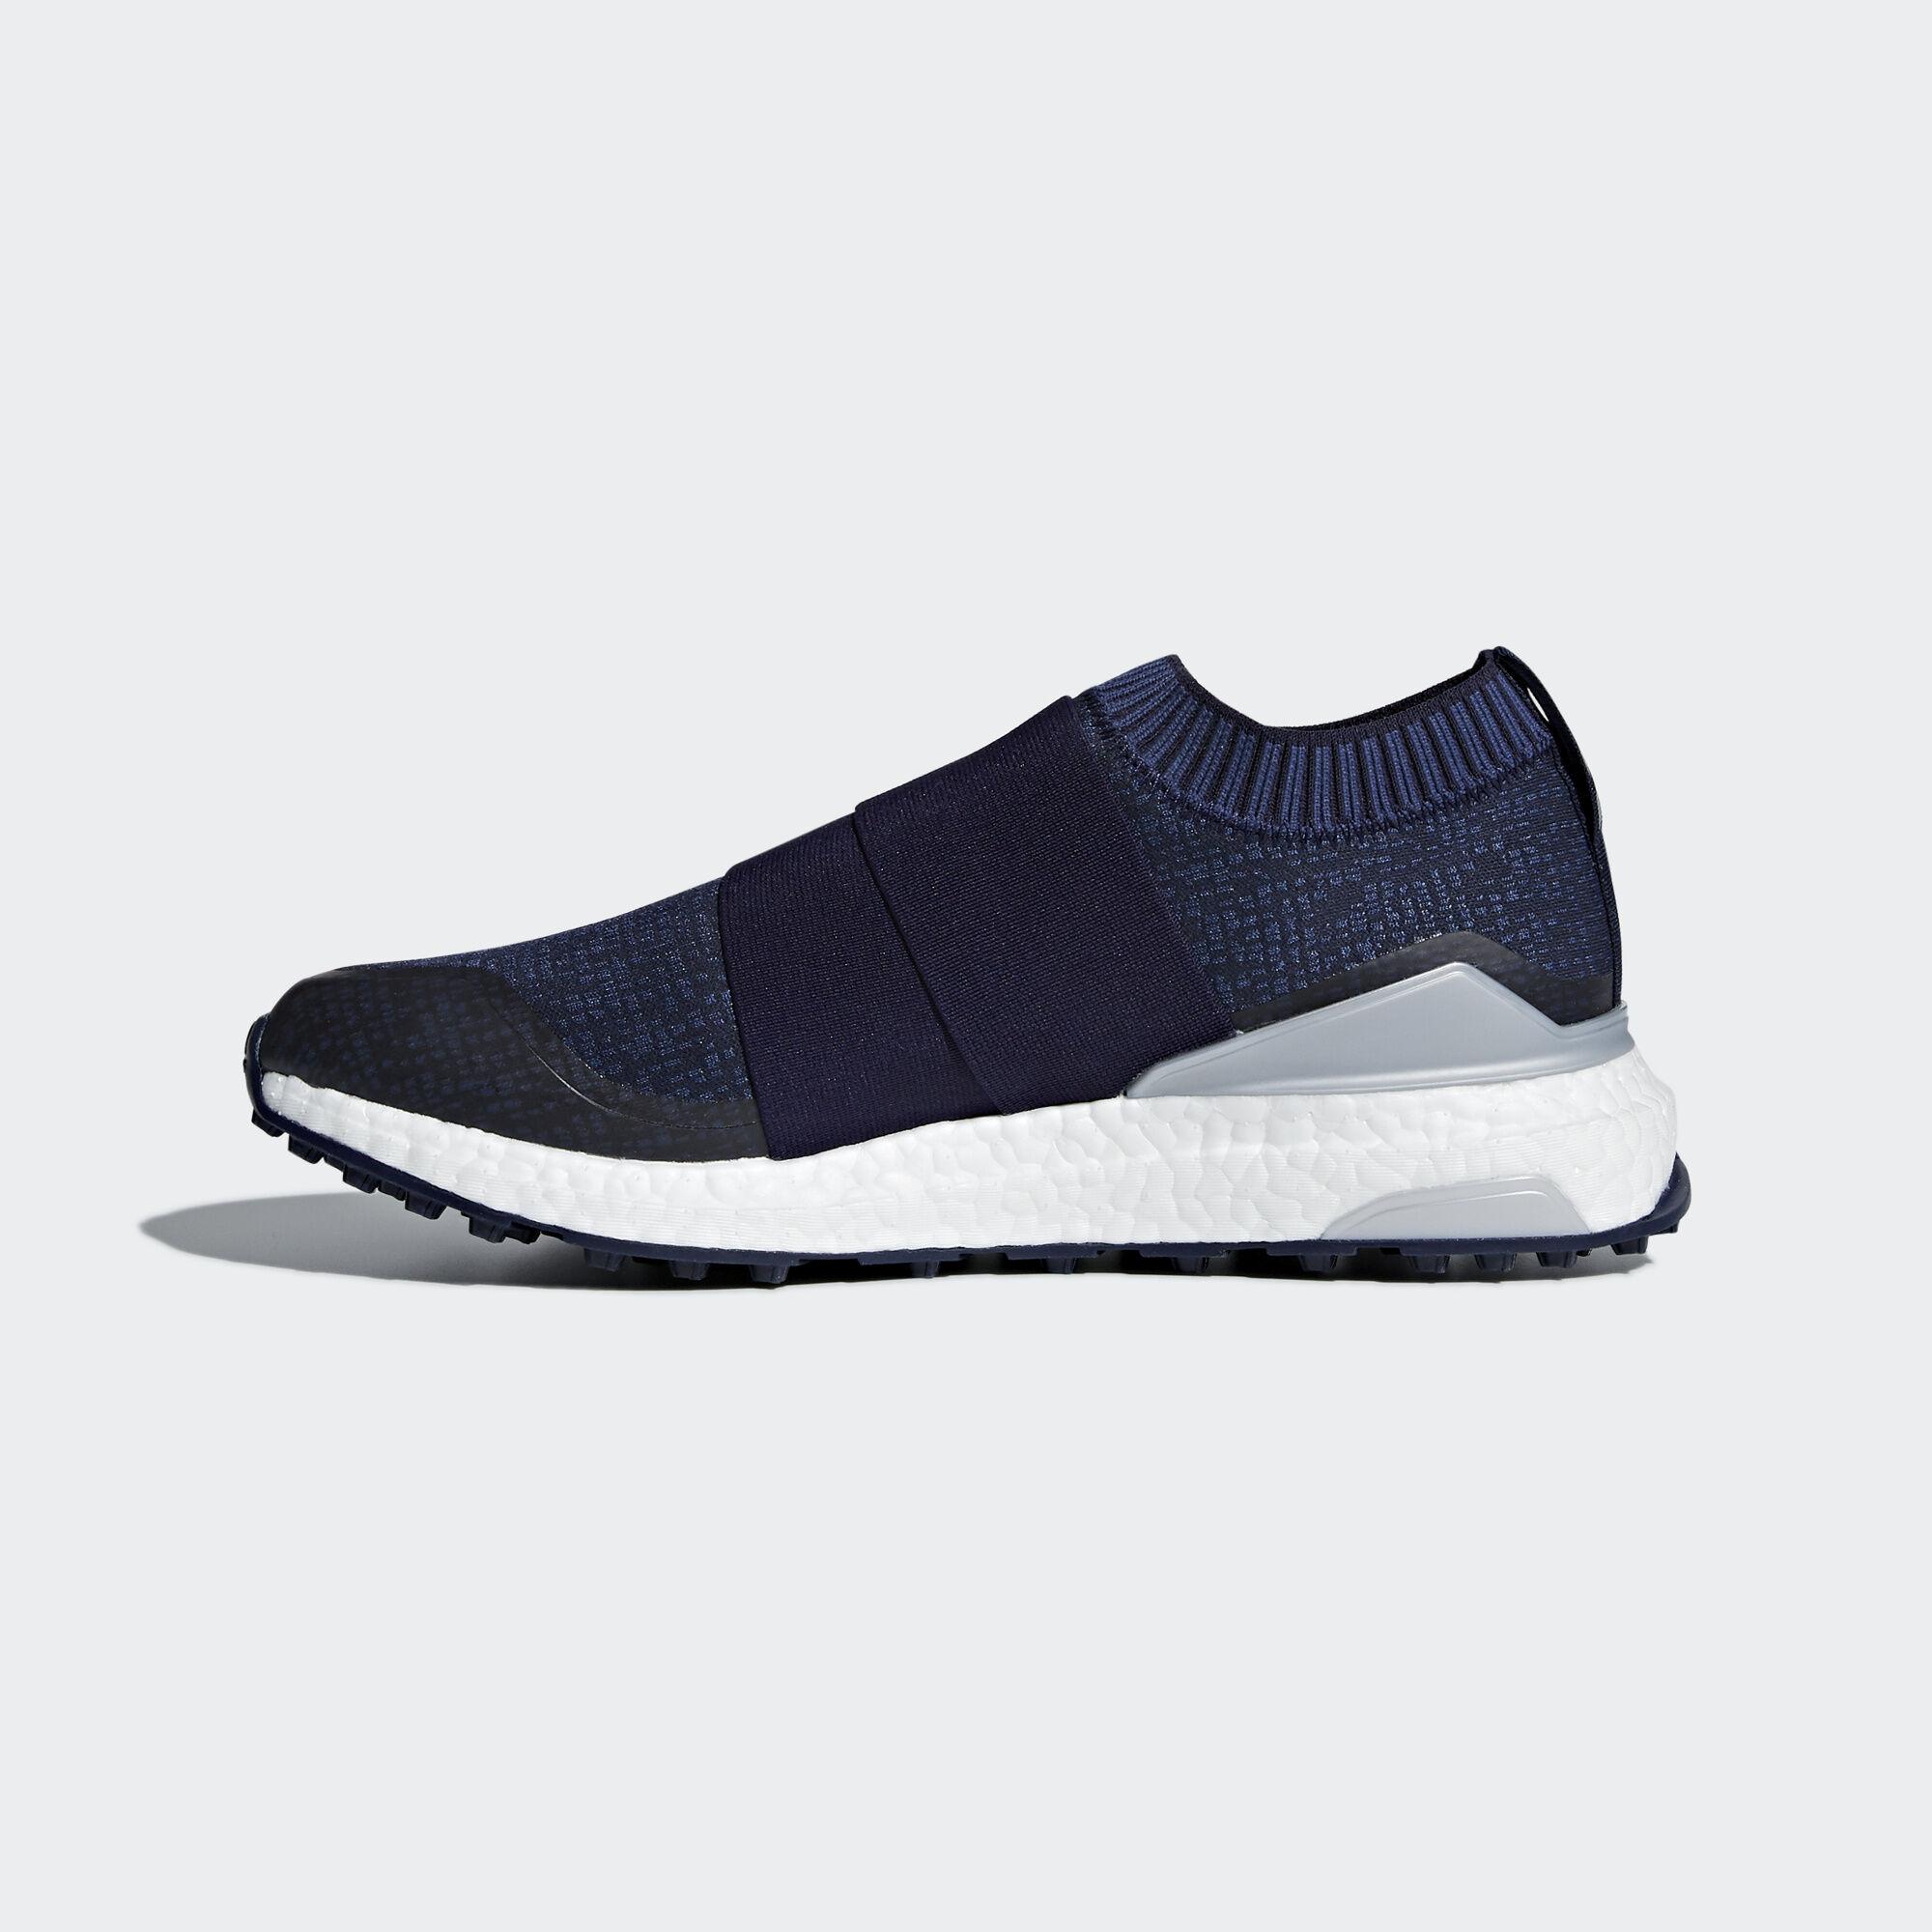 Adidas Crossknit Crossknit Crossknit 2.0 shoes Men's ff7513